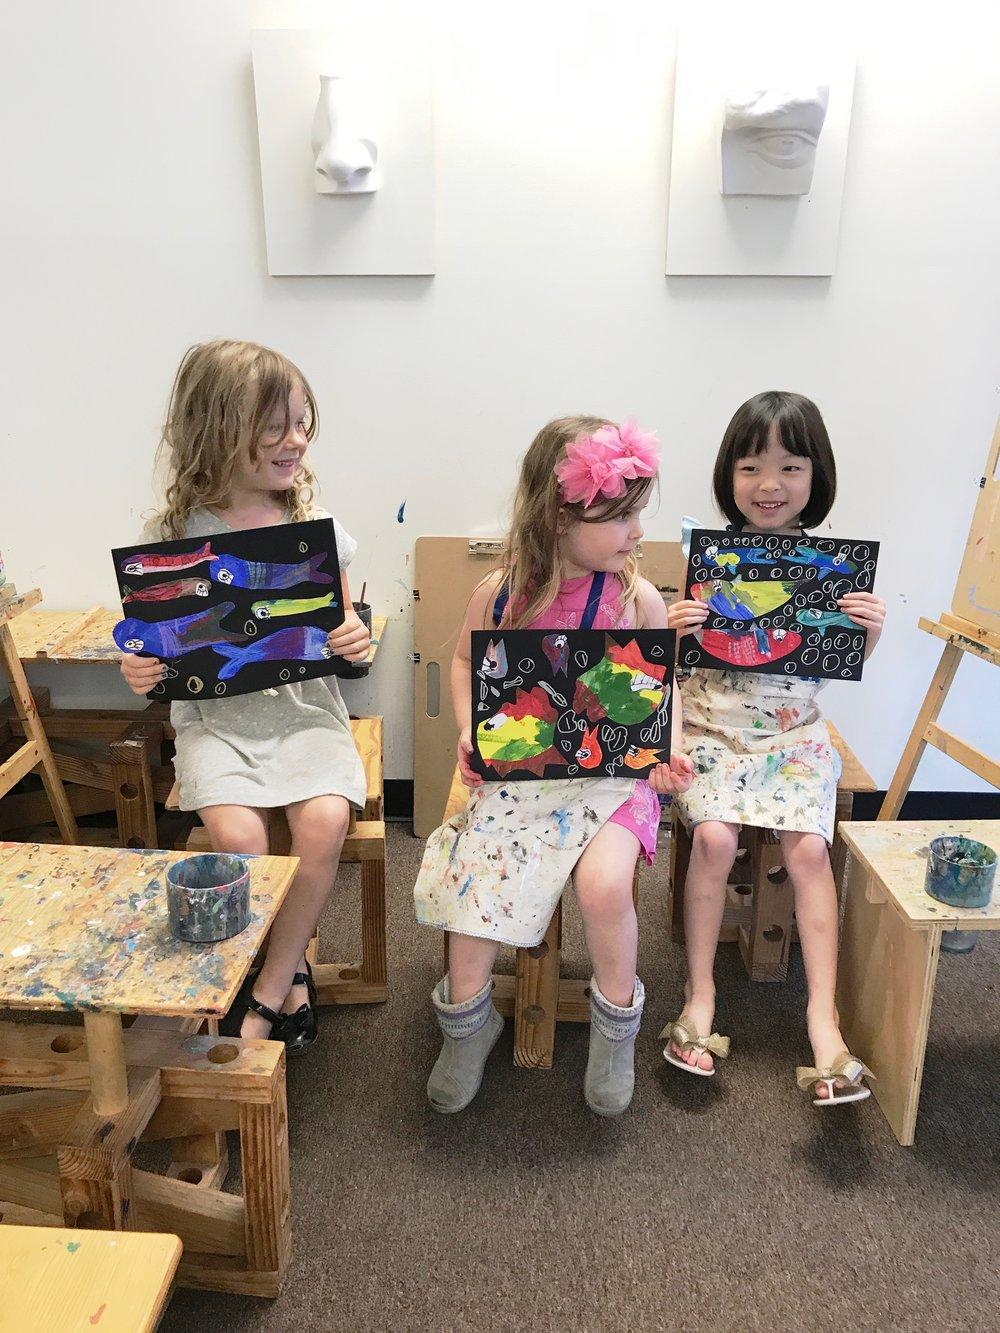 Kara Thachuk, Georgia Gammell, Charlotte Park Repeat Fish project Mini Makers 2017.jpg